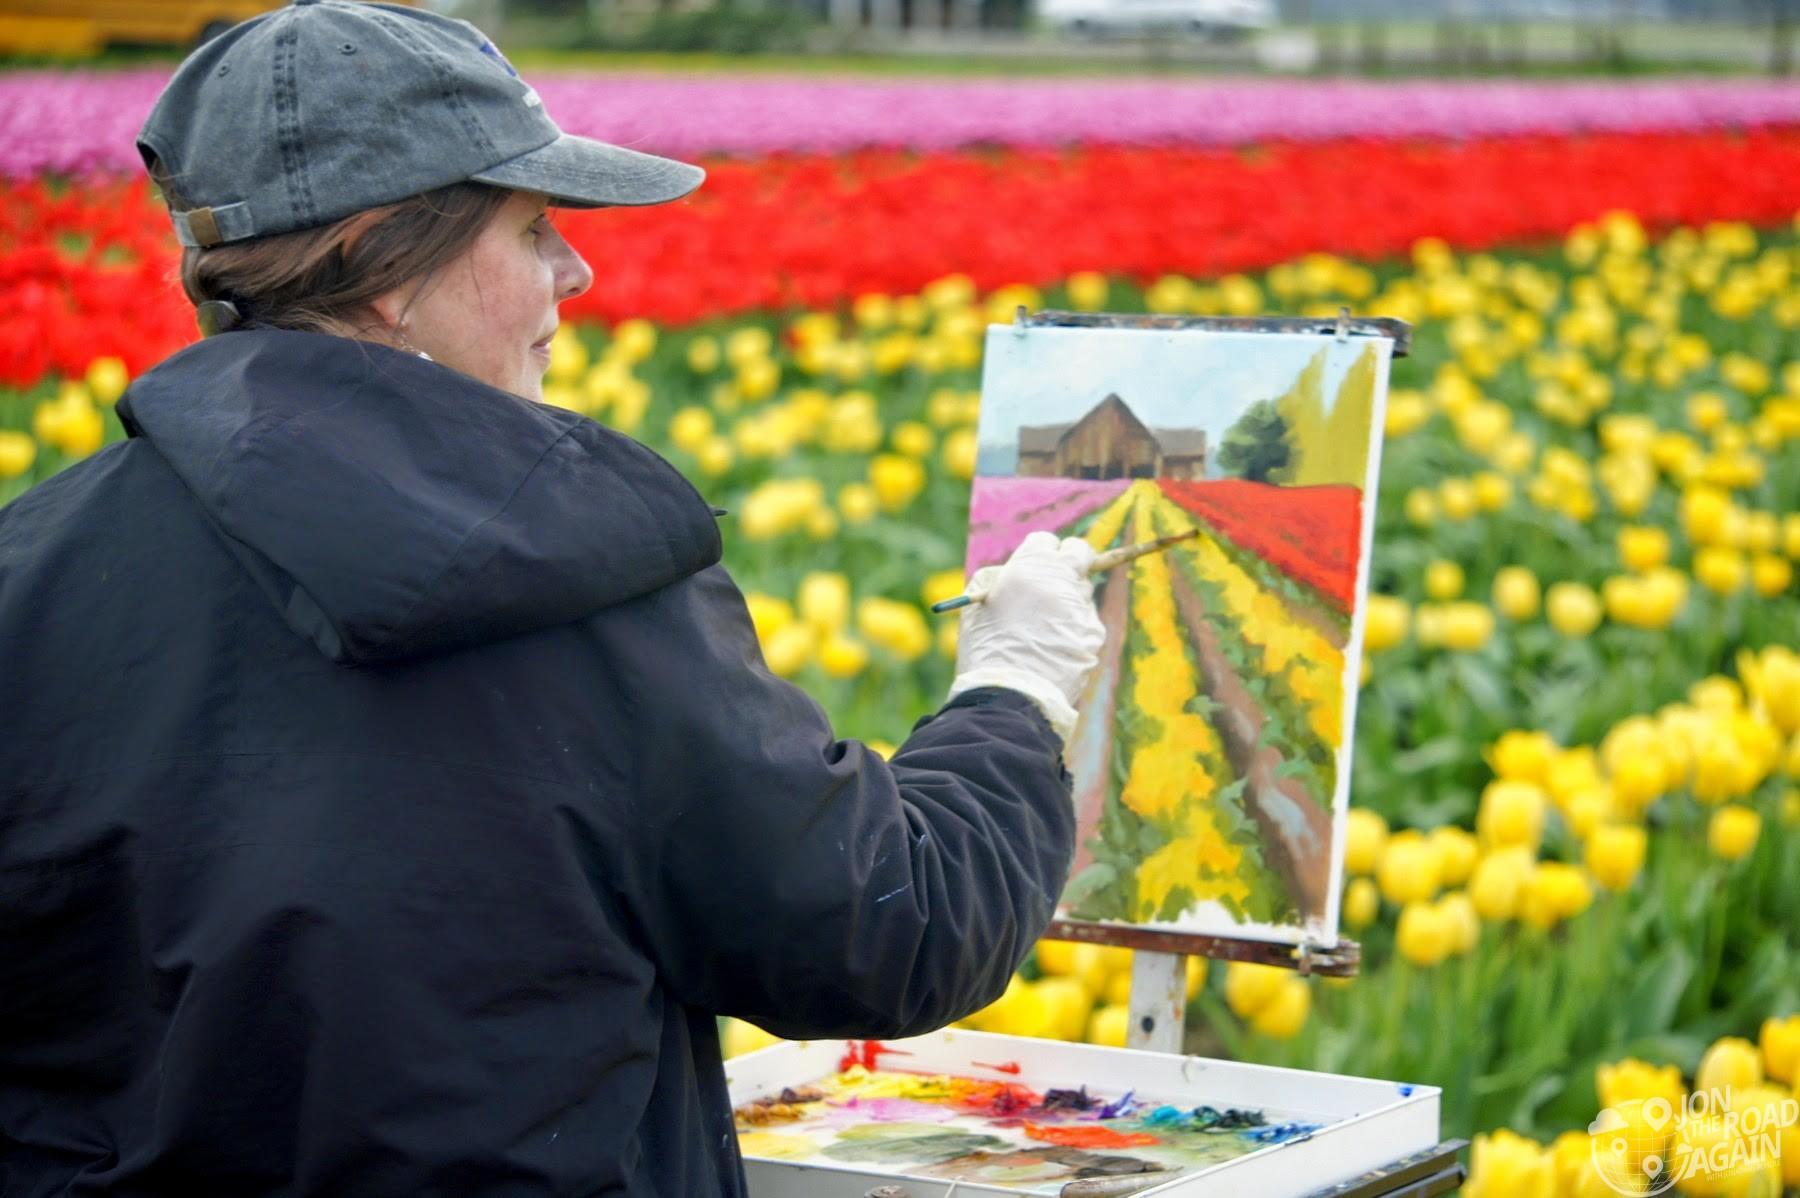 lady painting plein air at Skagit Vallet Tulip Festival